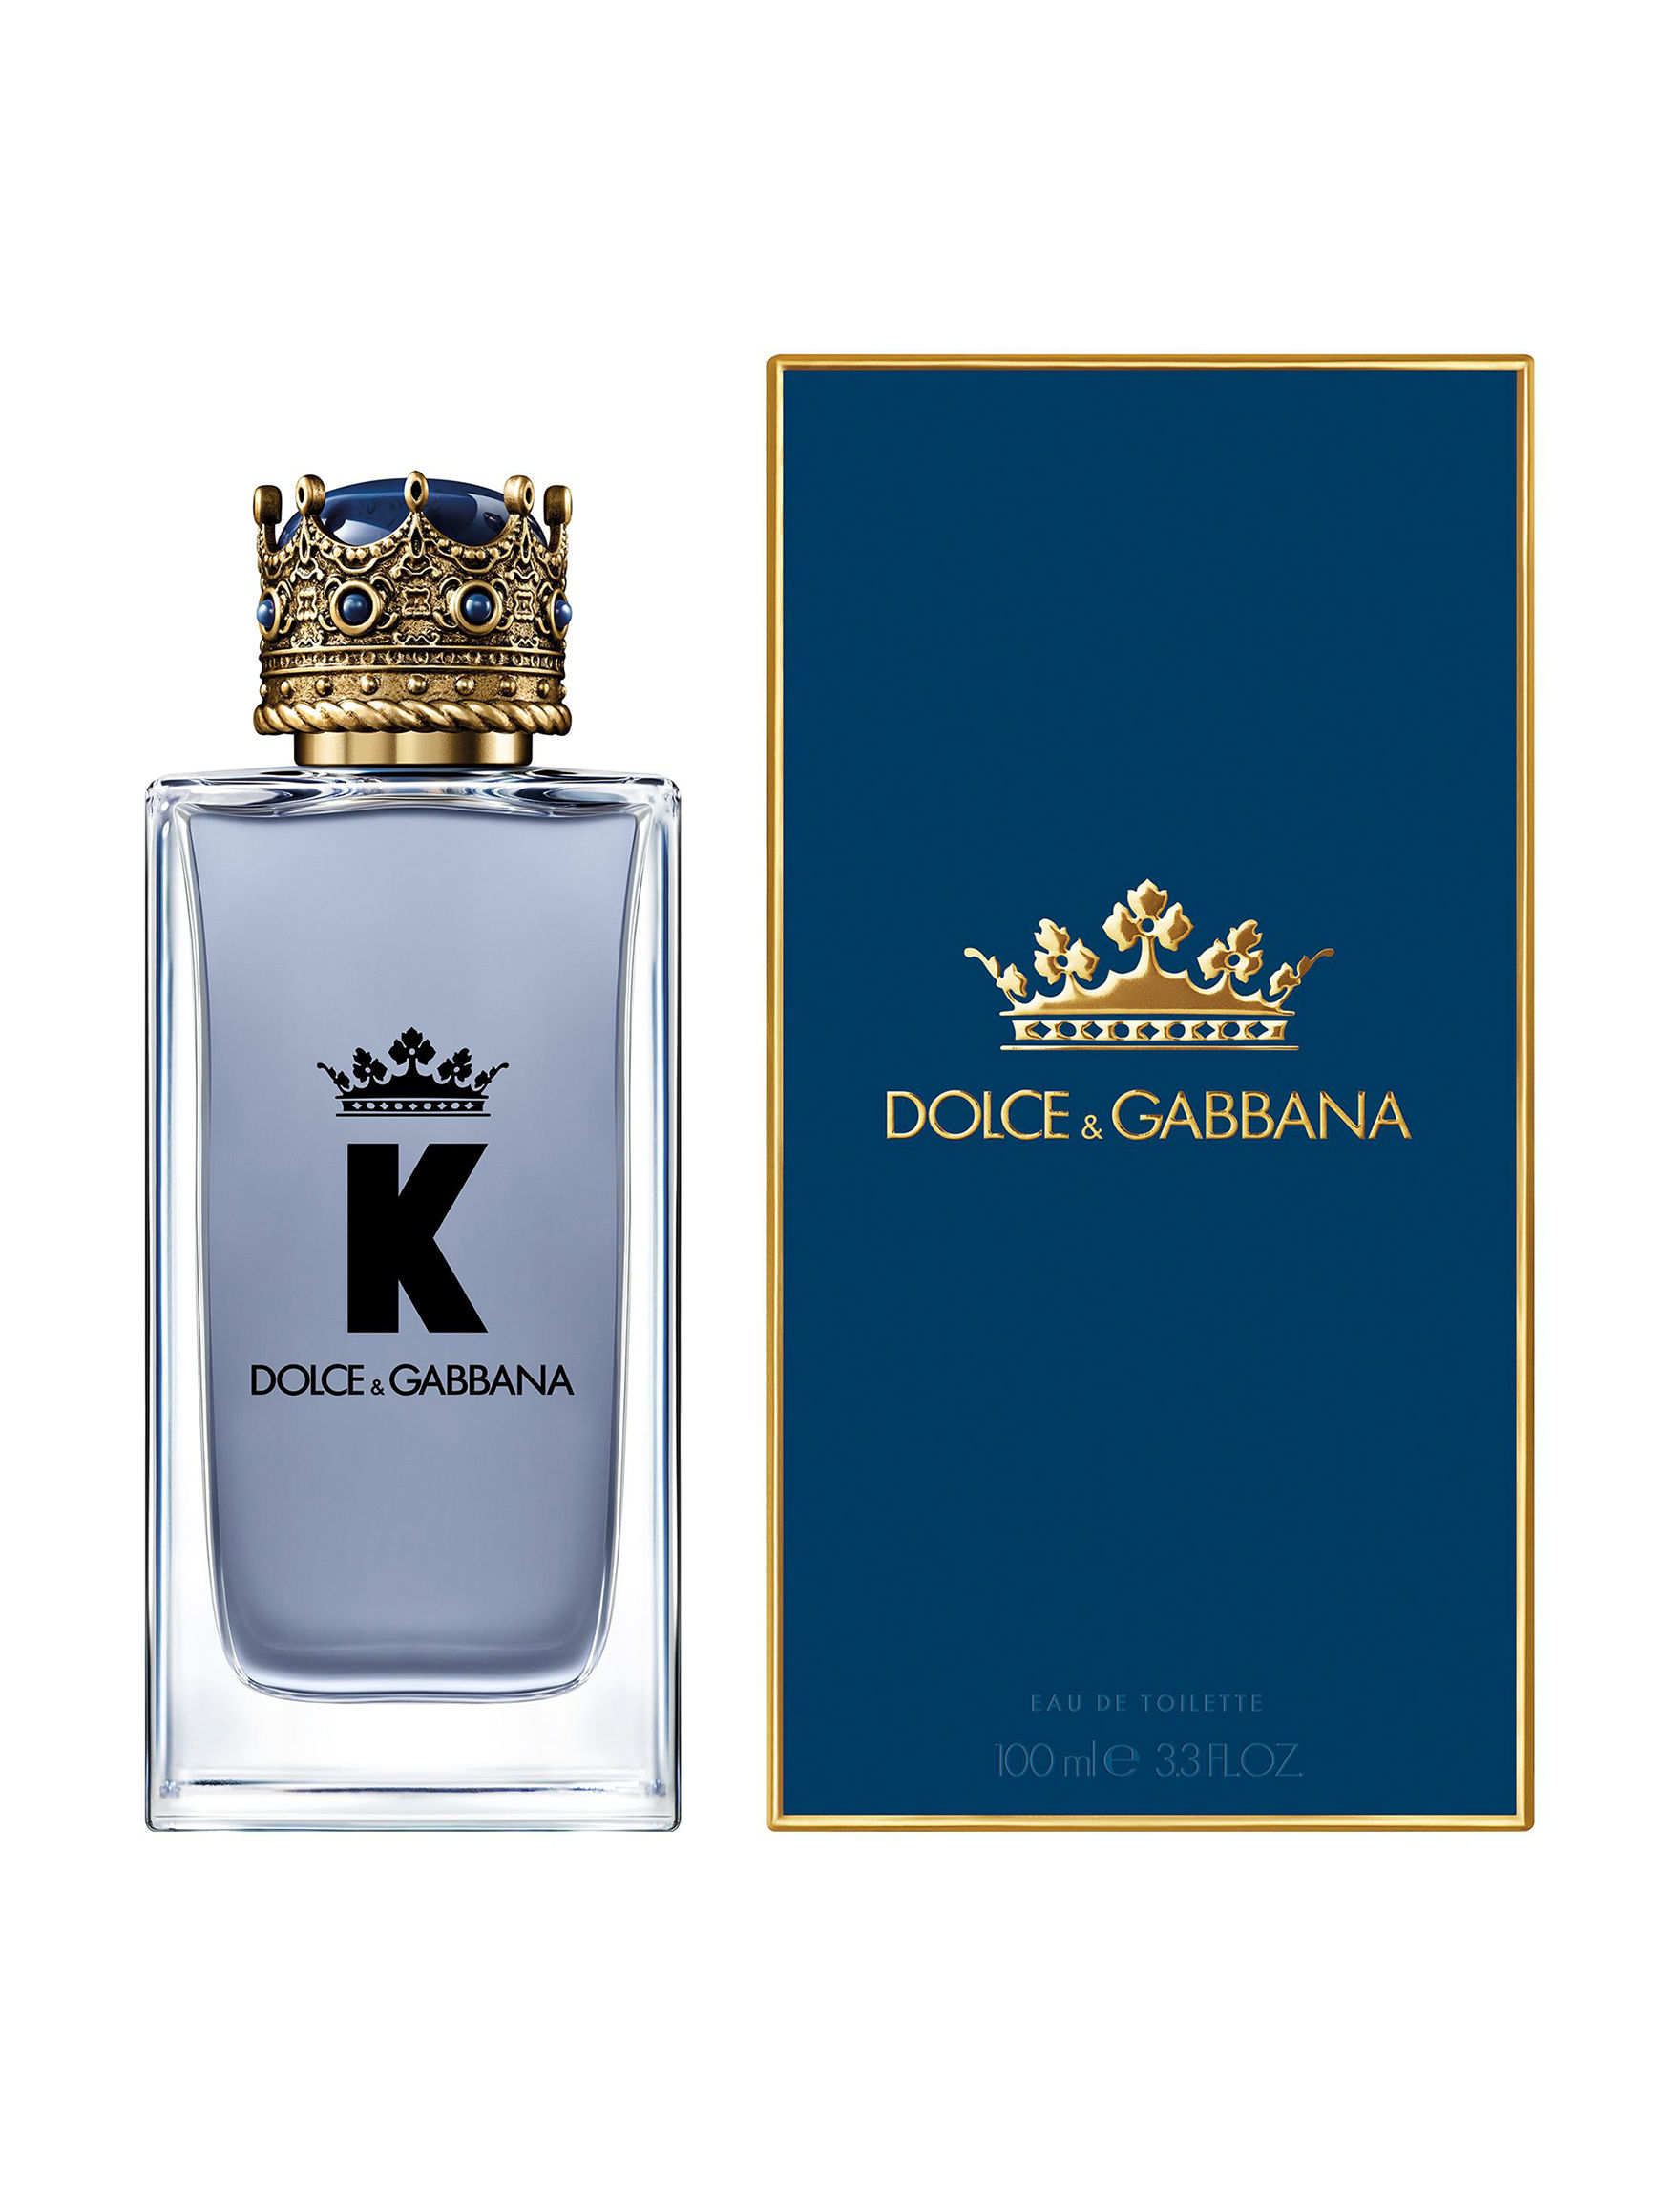 Dolce & Gabbana  Cologne